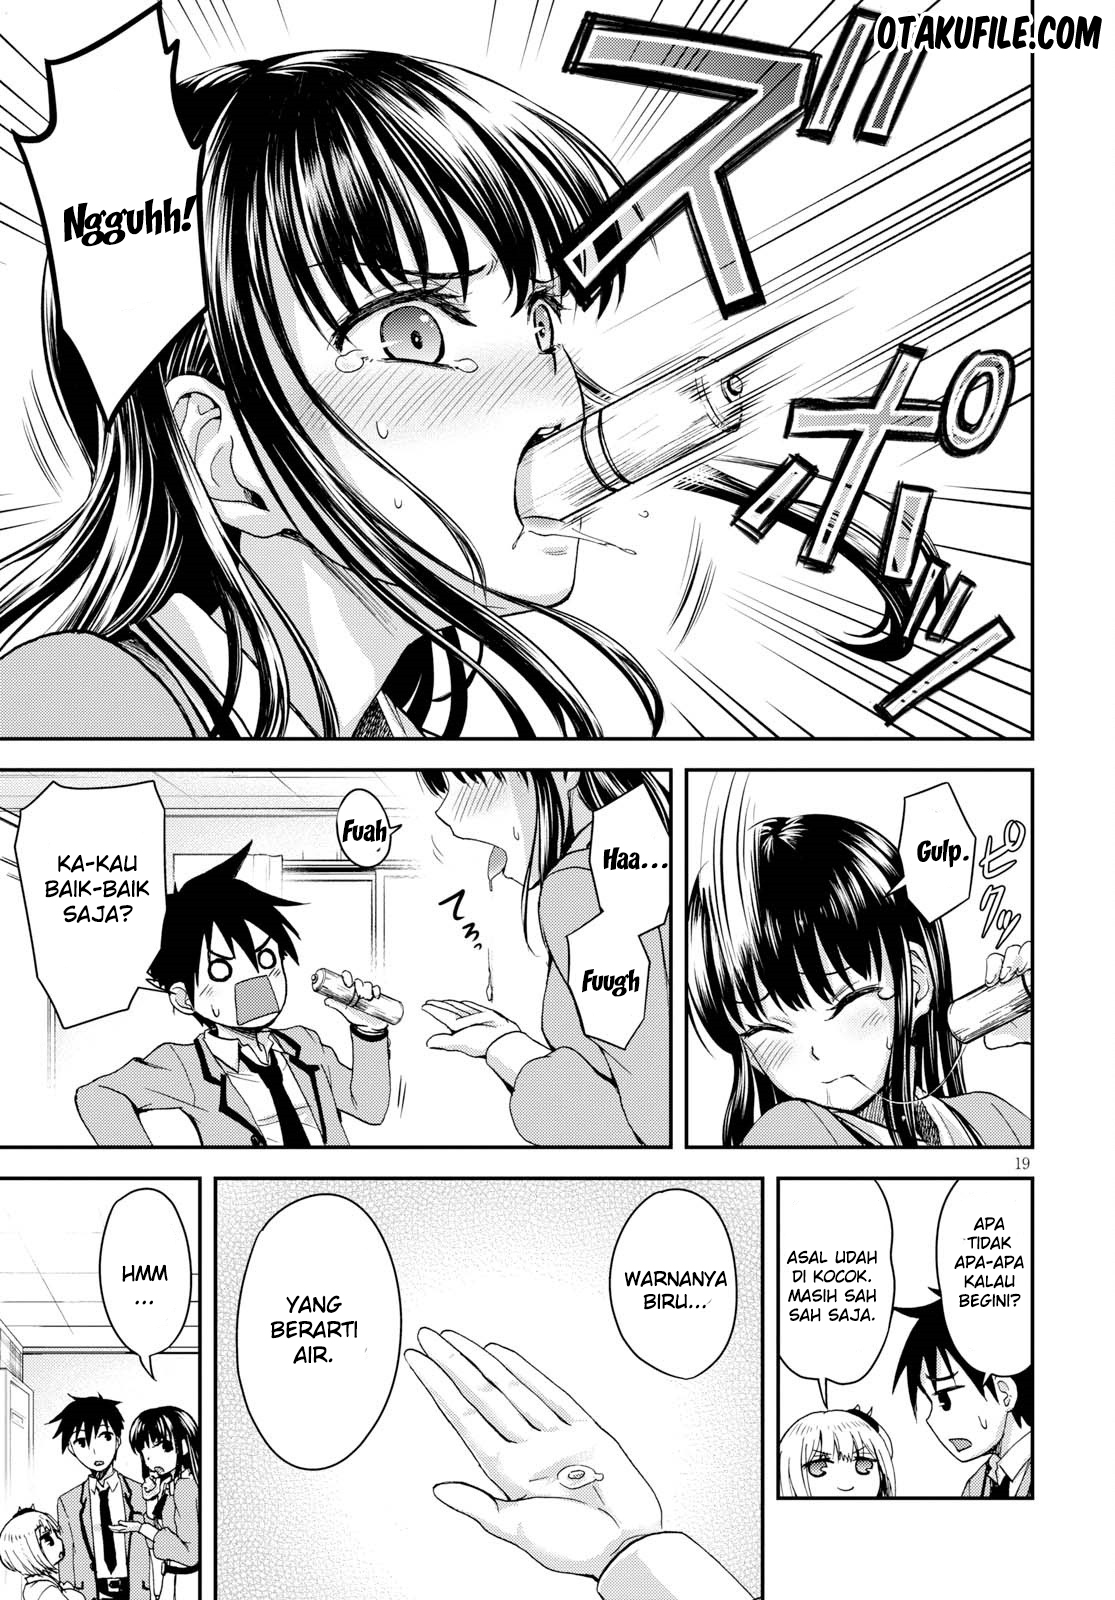 Shinobi Kill Chapter 3